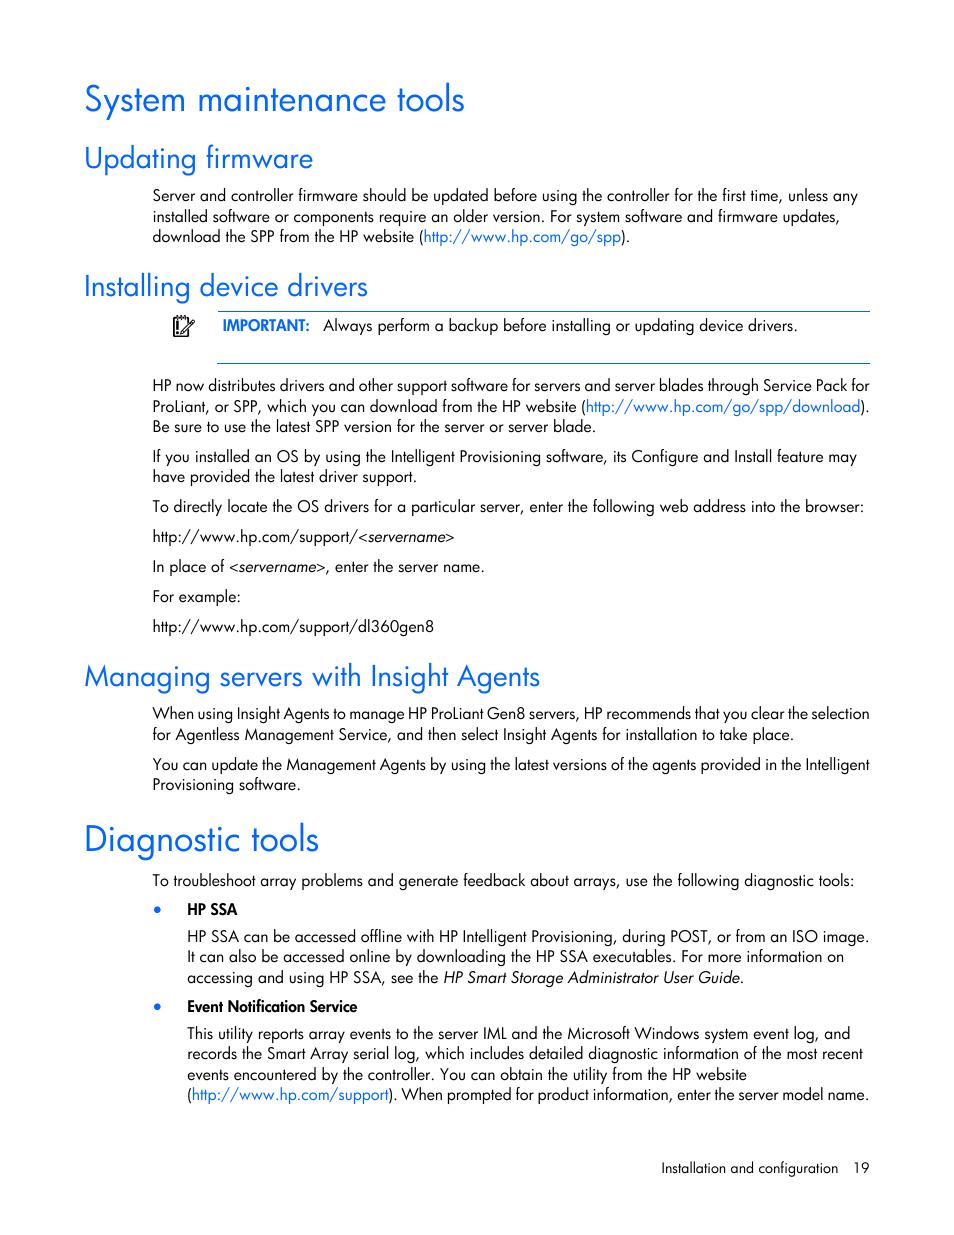 System maintenance tools, Updating firmware, Installing